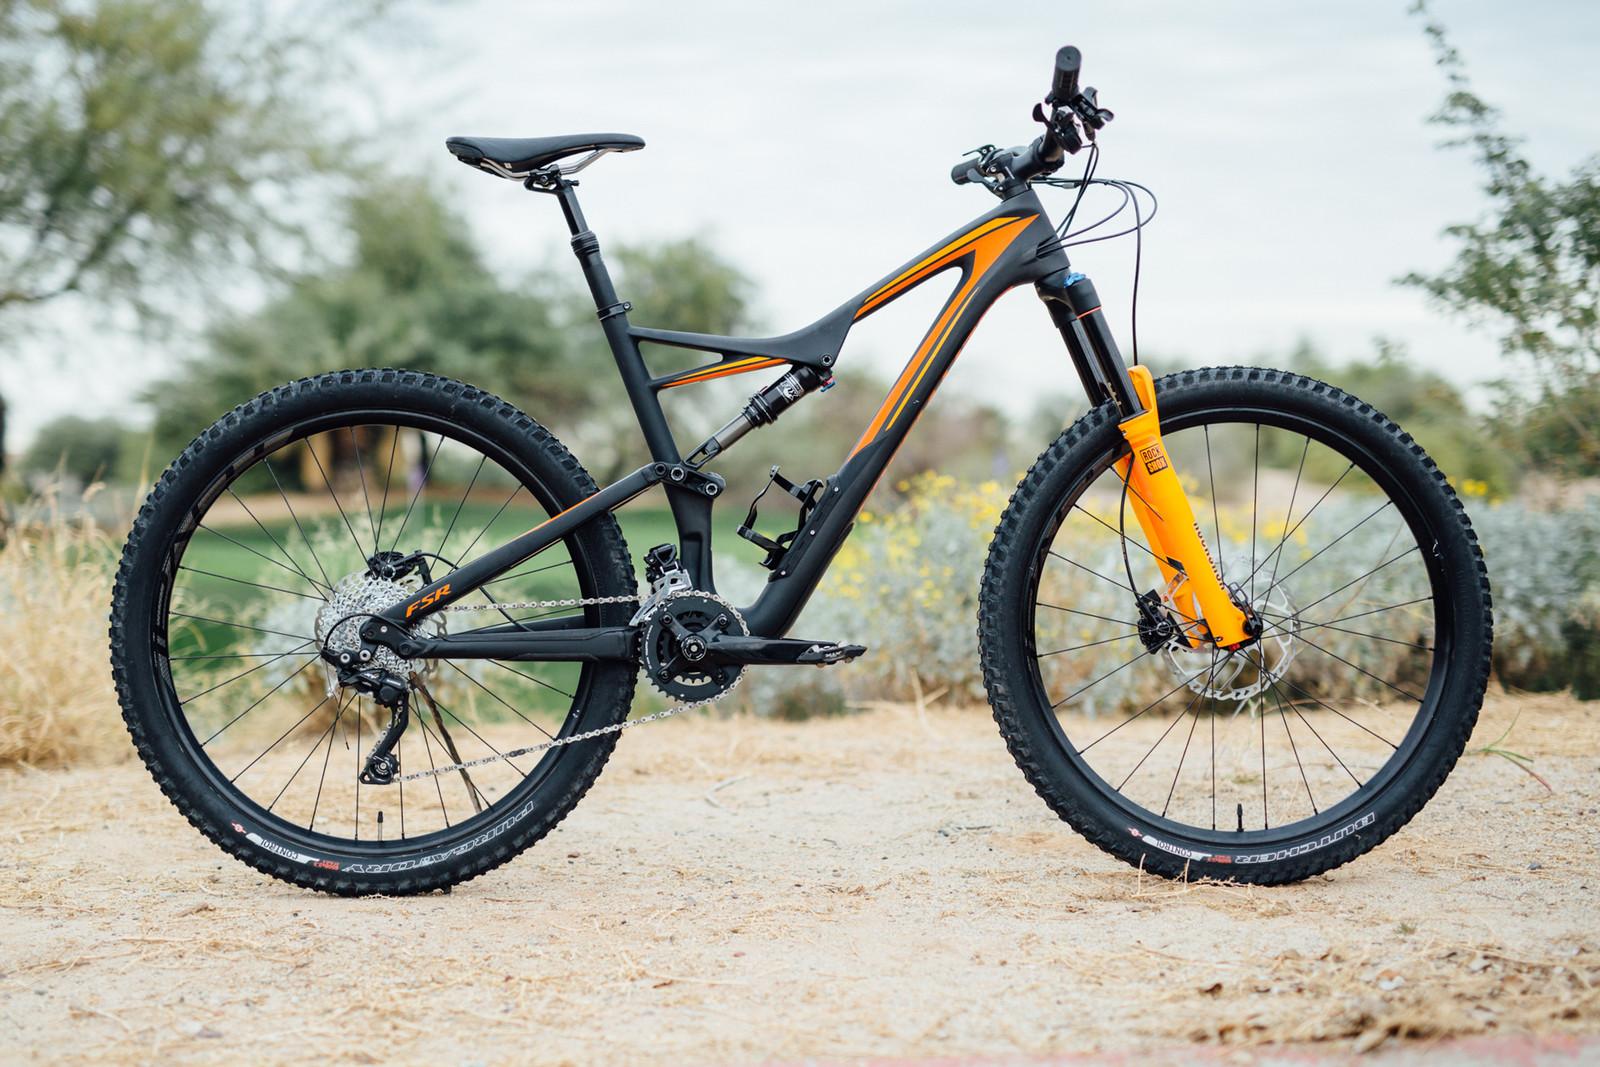 2016 Specialized Stumpjumper FSR Comp Carbon 650B - 17 Bikes Tested - 2016 Vital MTB Test Sessions - Mountain Biking Pictures - Vital MTB